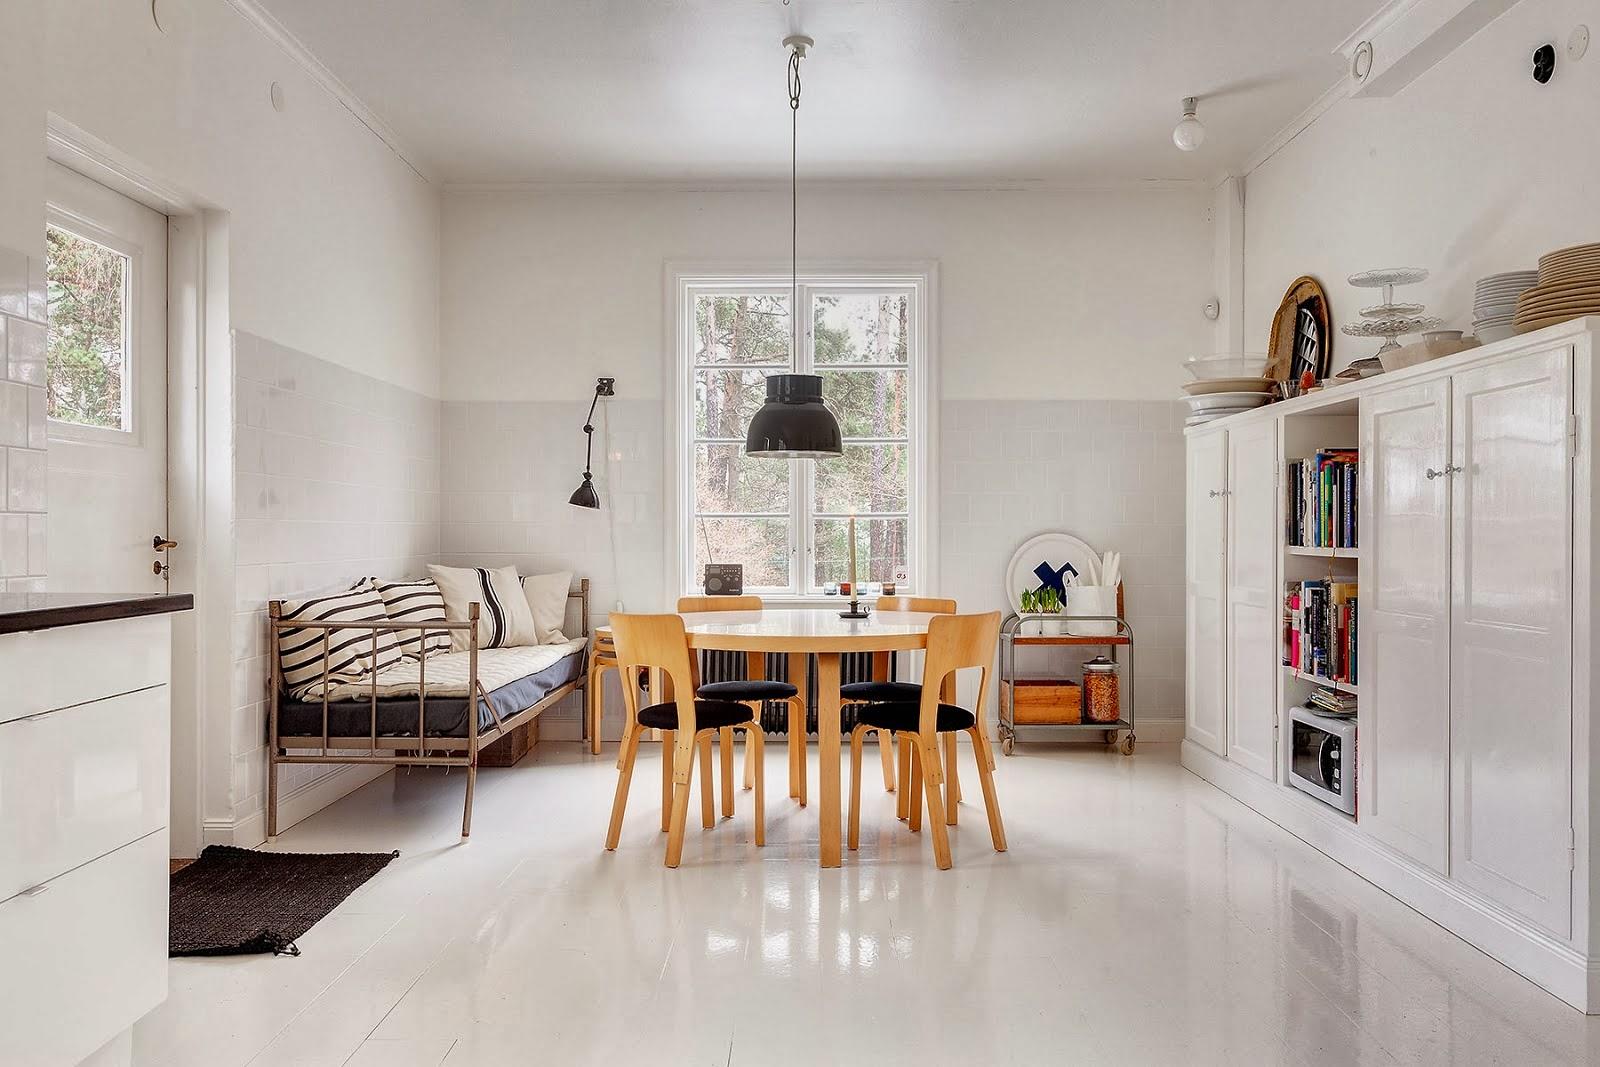 Ilia estudio interiorismo dise o n rdico en esta vivienda for Interiorismo estilo nordico